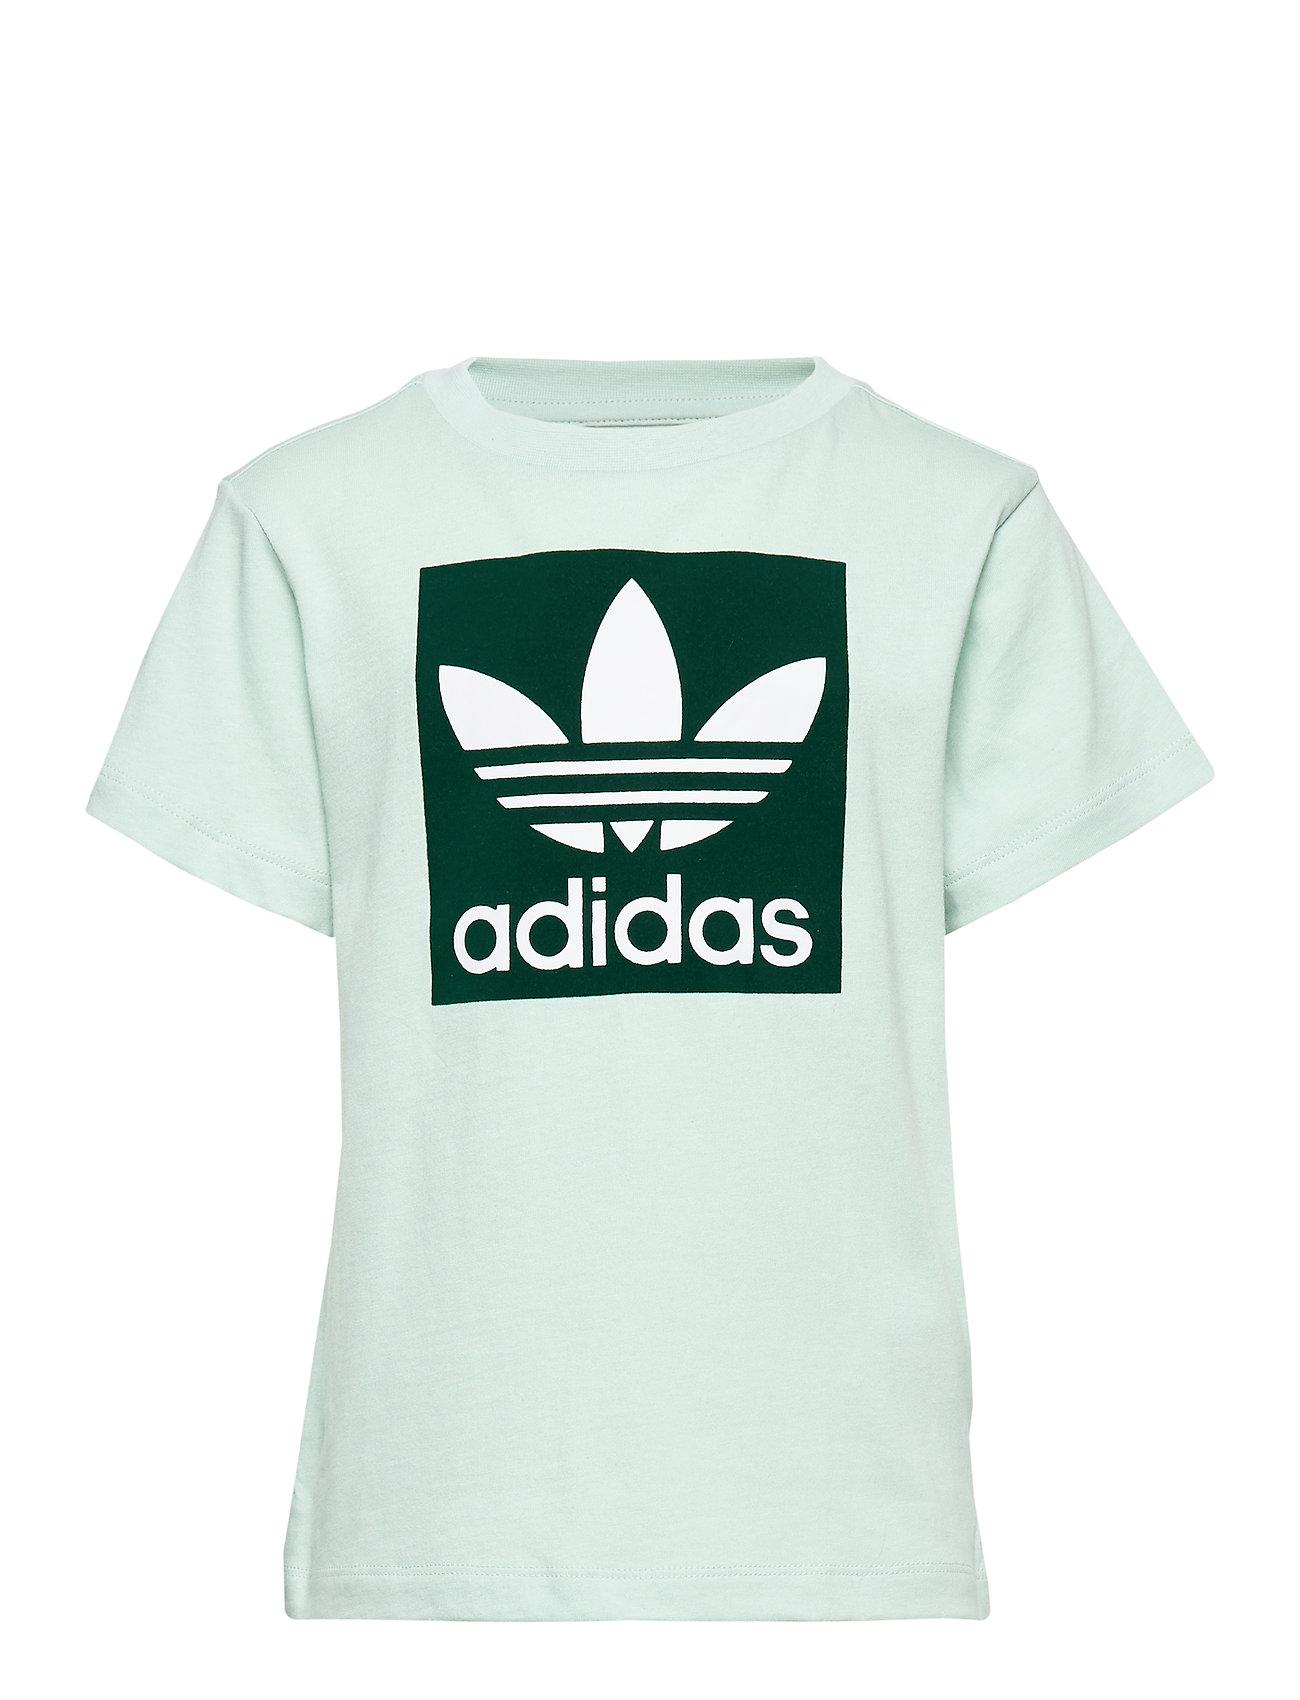 adidas Originals TREEFOIL TEE - VAPGRN/CGREEN/WHITE